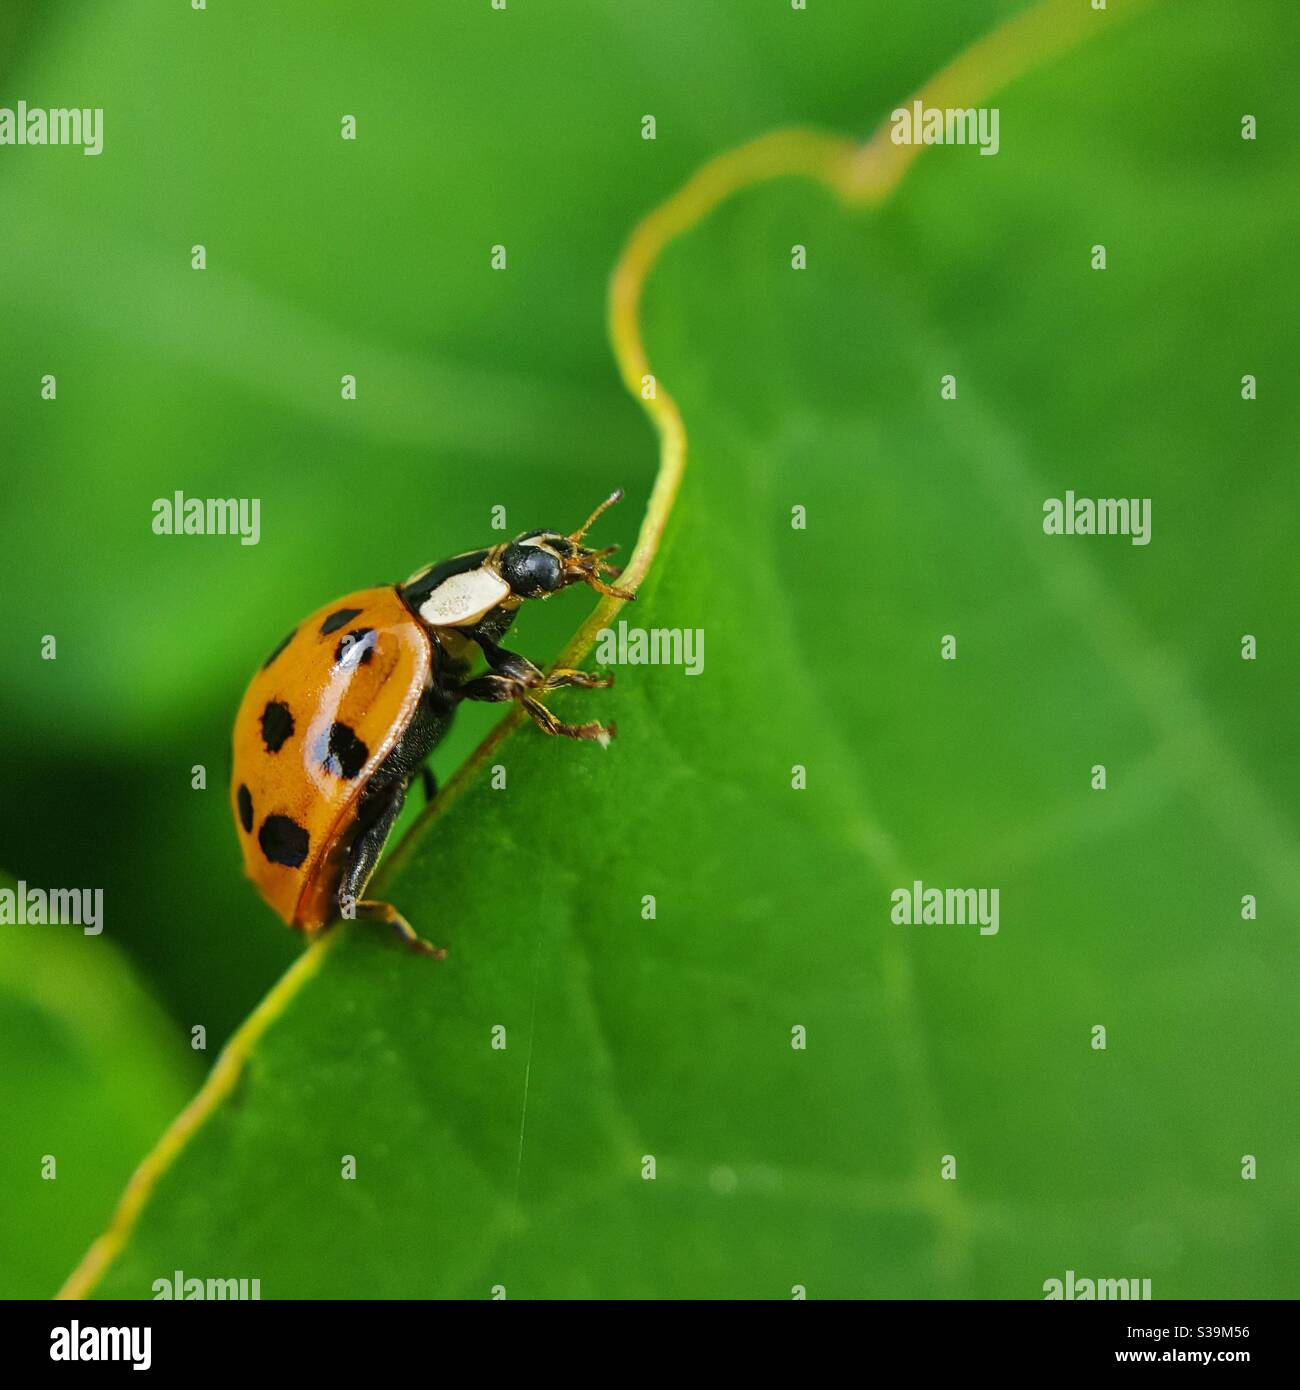 Arlequin Ladybird Climbing Leaf Banque D'Images